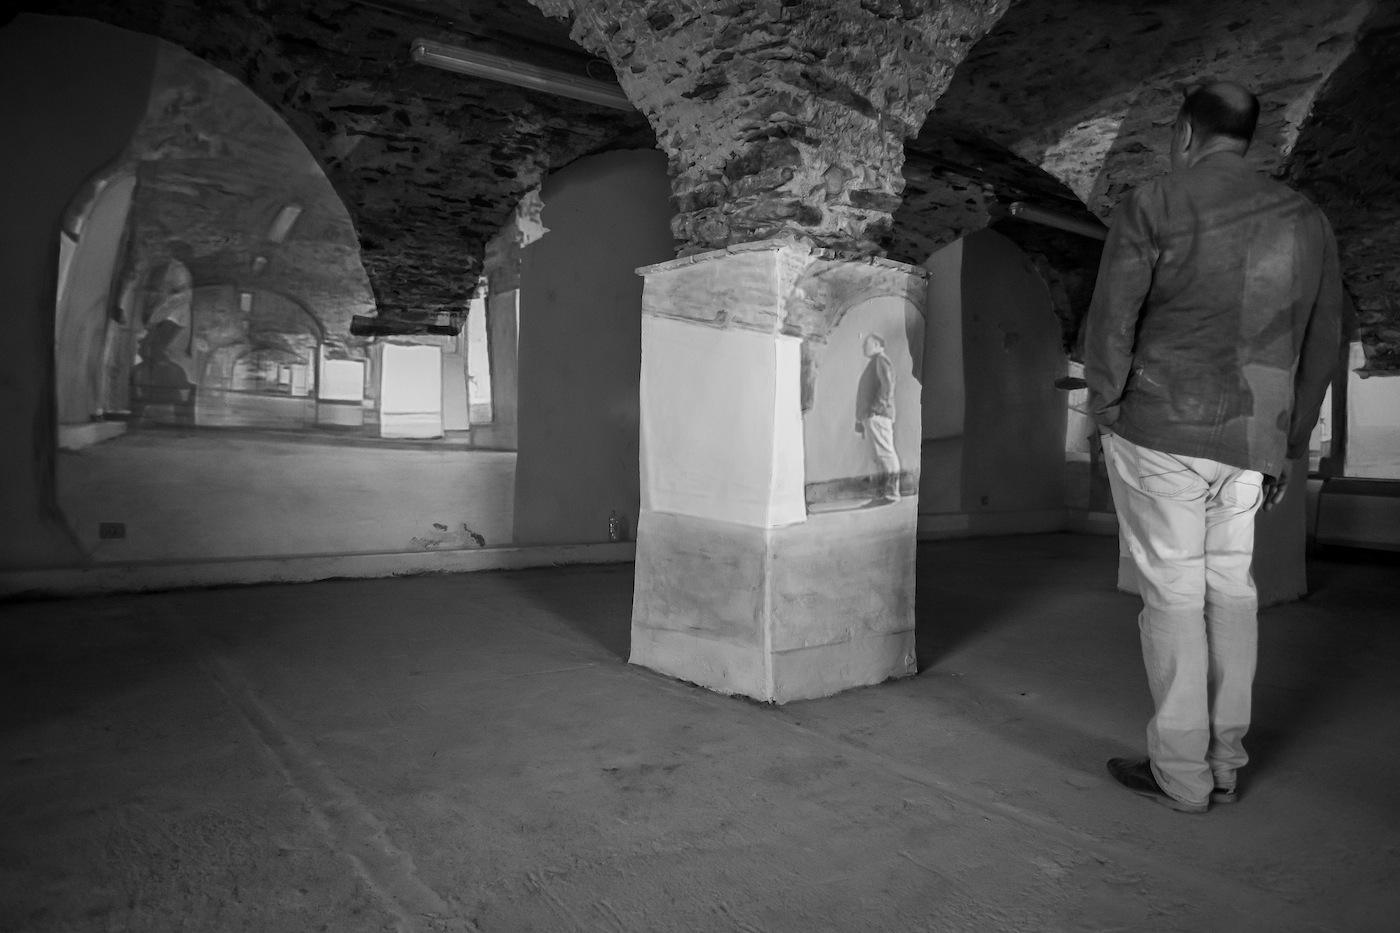 Andrea Aquilanti, veduta della mostra. Foto: Alessandro Paolini Studio 47, Carrara